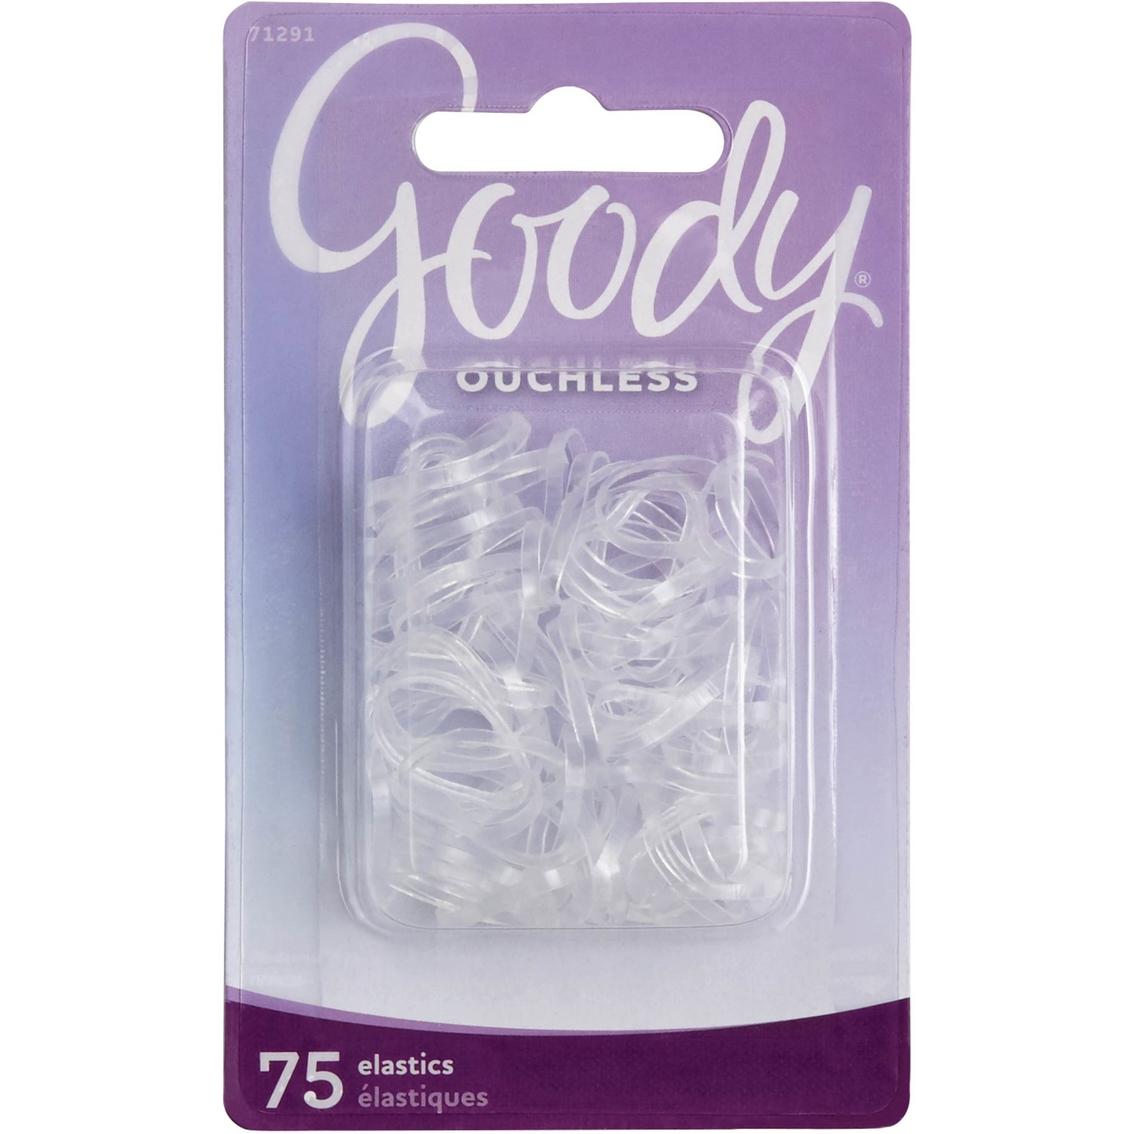 Goody Ouchless Mini Crystal Polyband Hair Tie Elastic 75 Pk.  b226d63d7a0